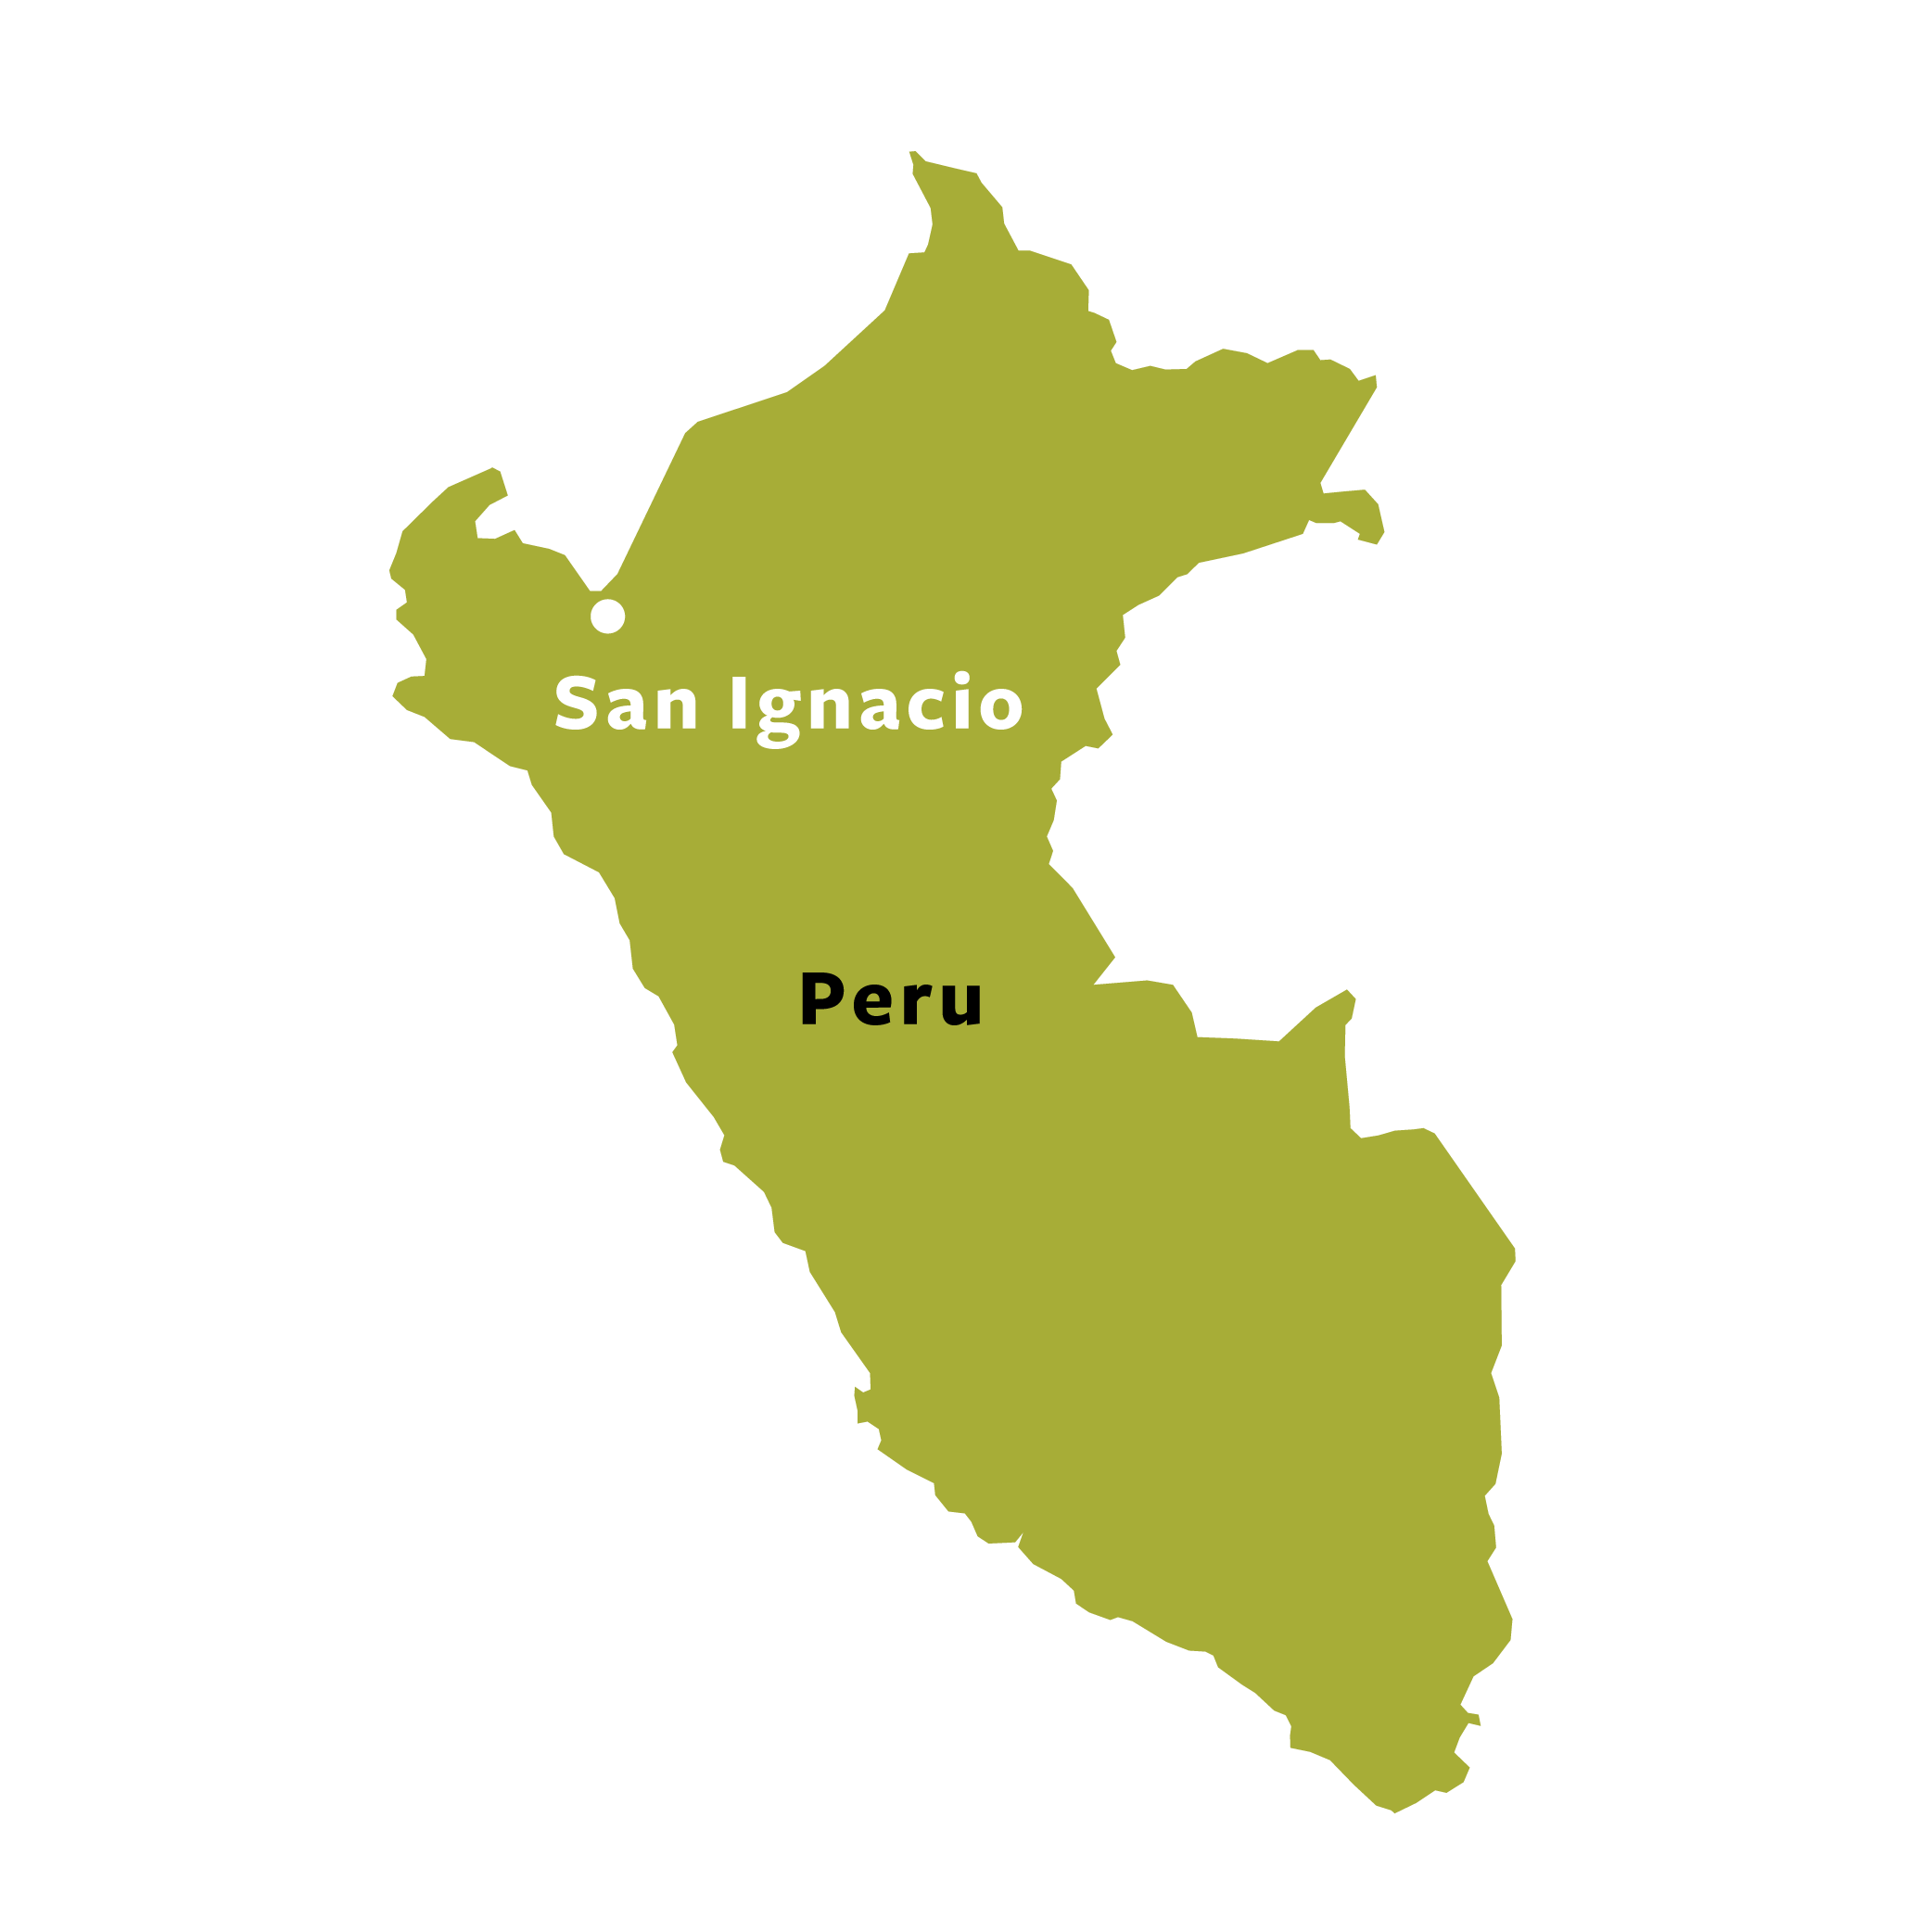 Map of San Ignacio, Peru